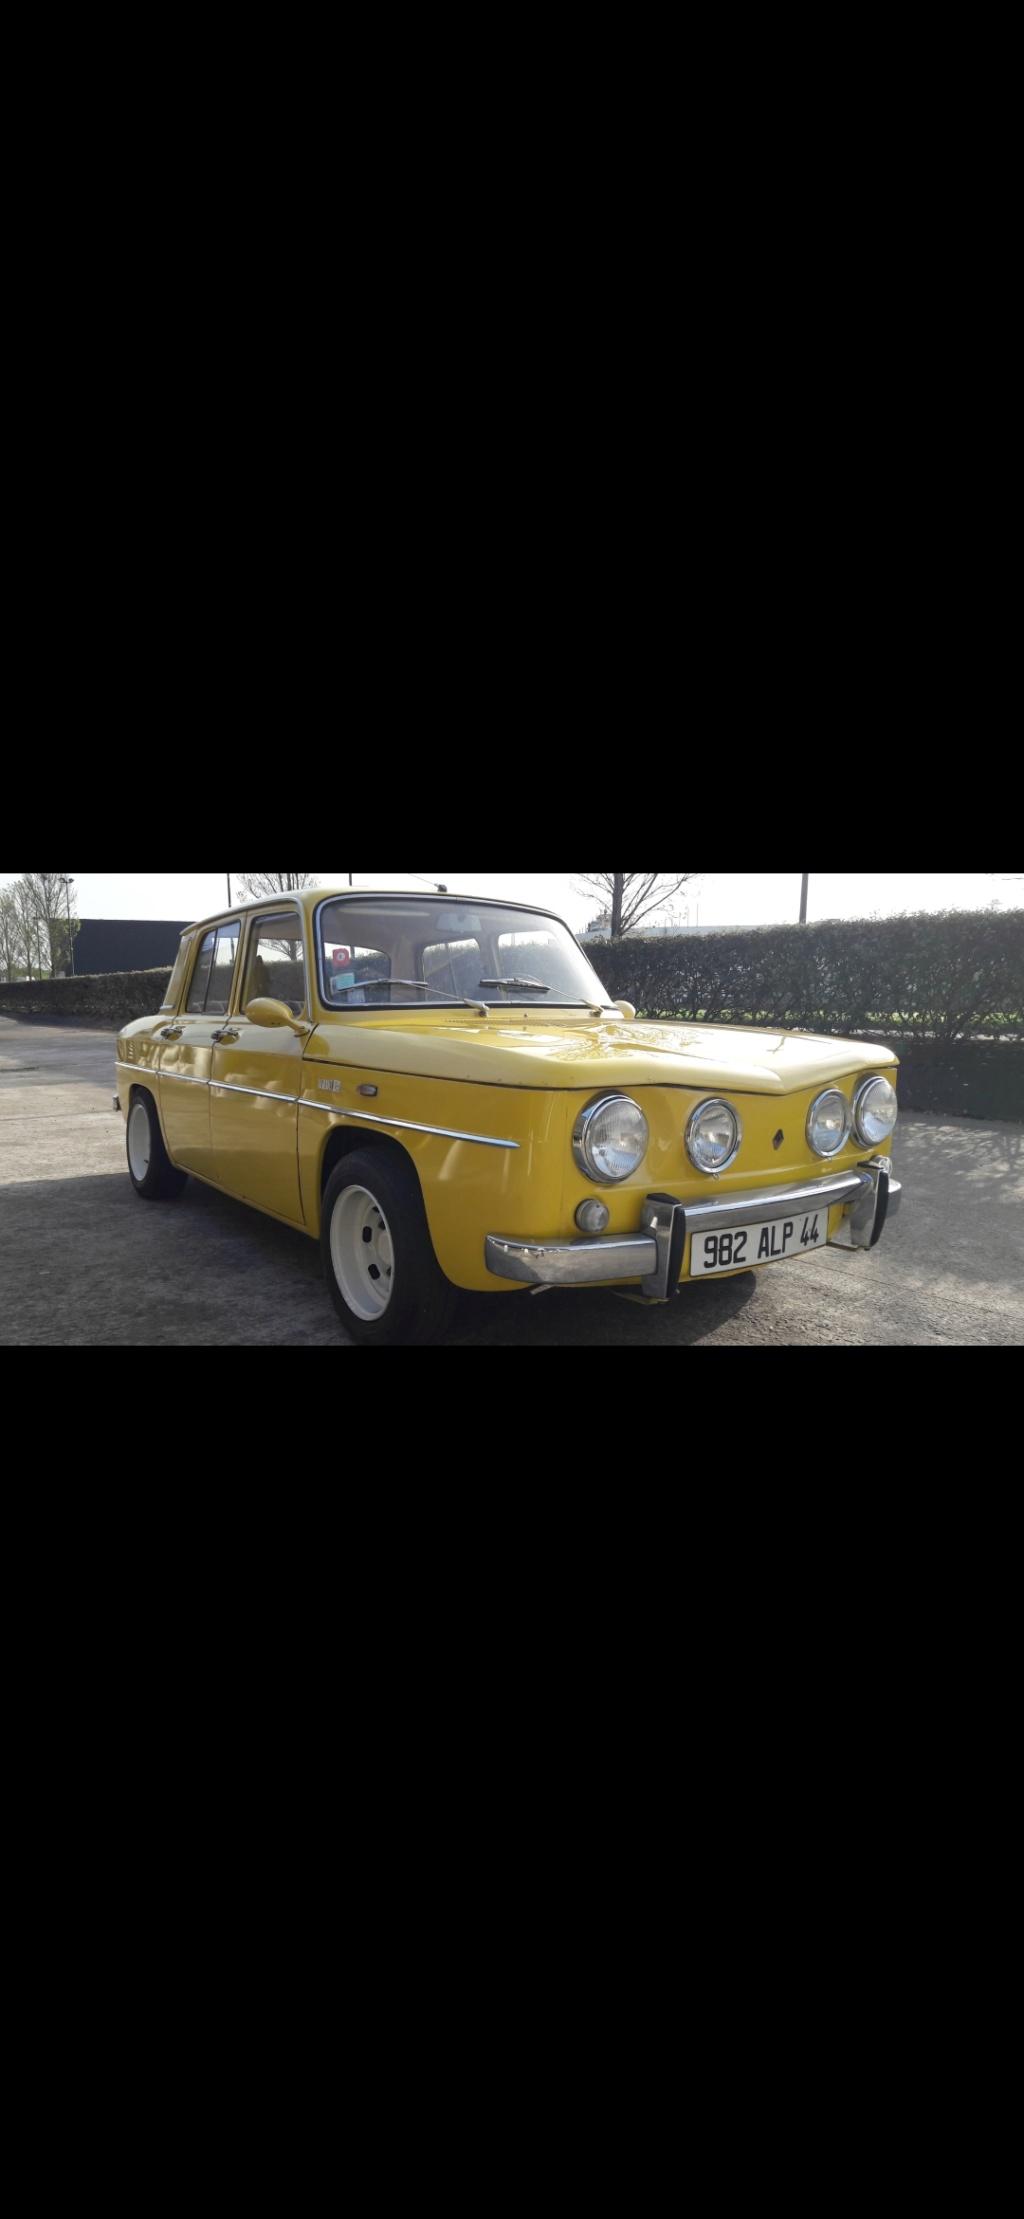 Imprimer une carro de Renault 12 en 3d  Screen10